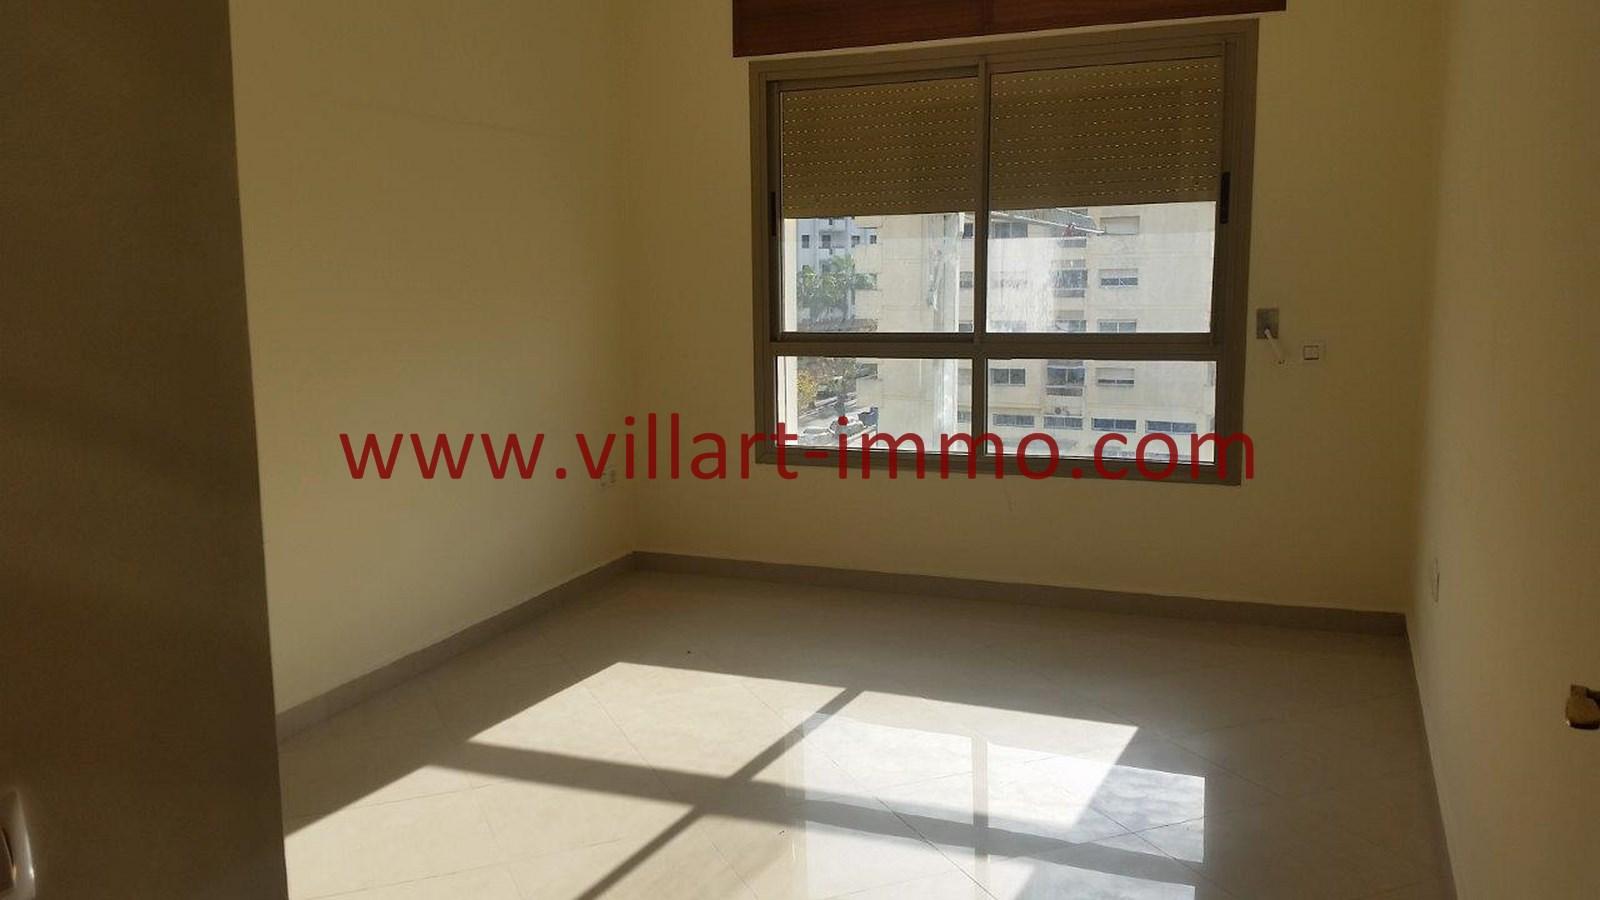 8-a-louer-appartement-tanger-iberia-chambre-2-l907-villart-immo